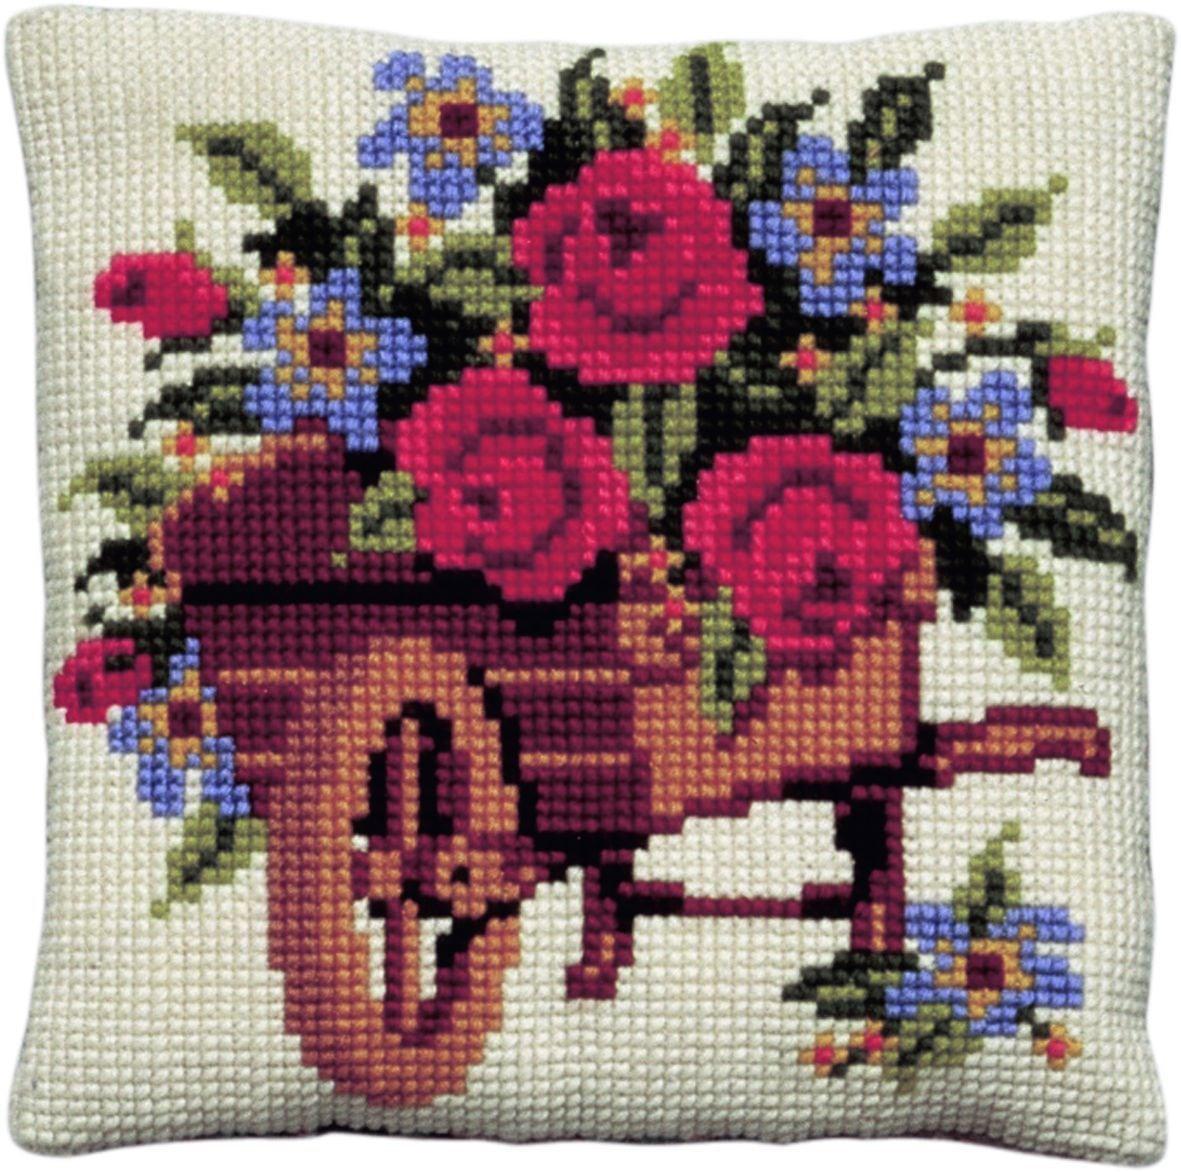 cross stitch cushion wheelbarrow with flowers